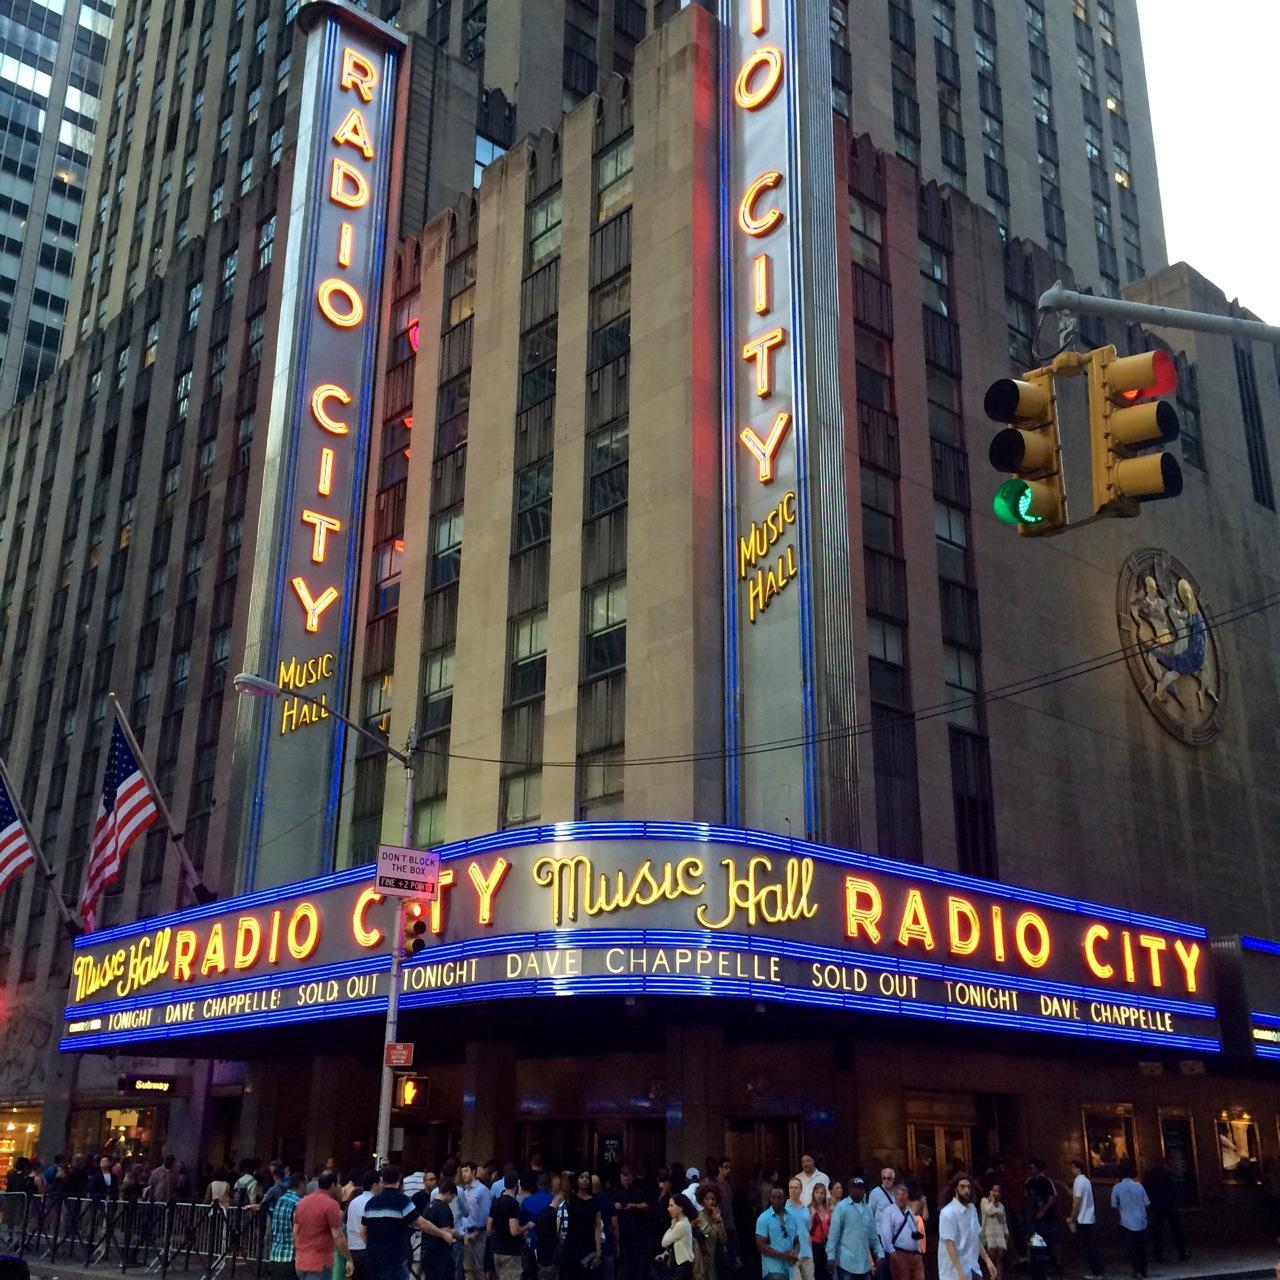 Shepard Fairey Dave Chappelle Radio City AM 2